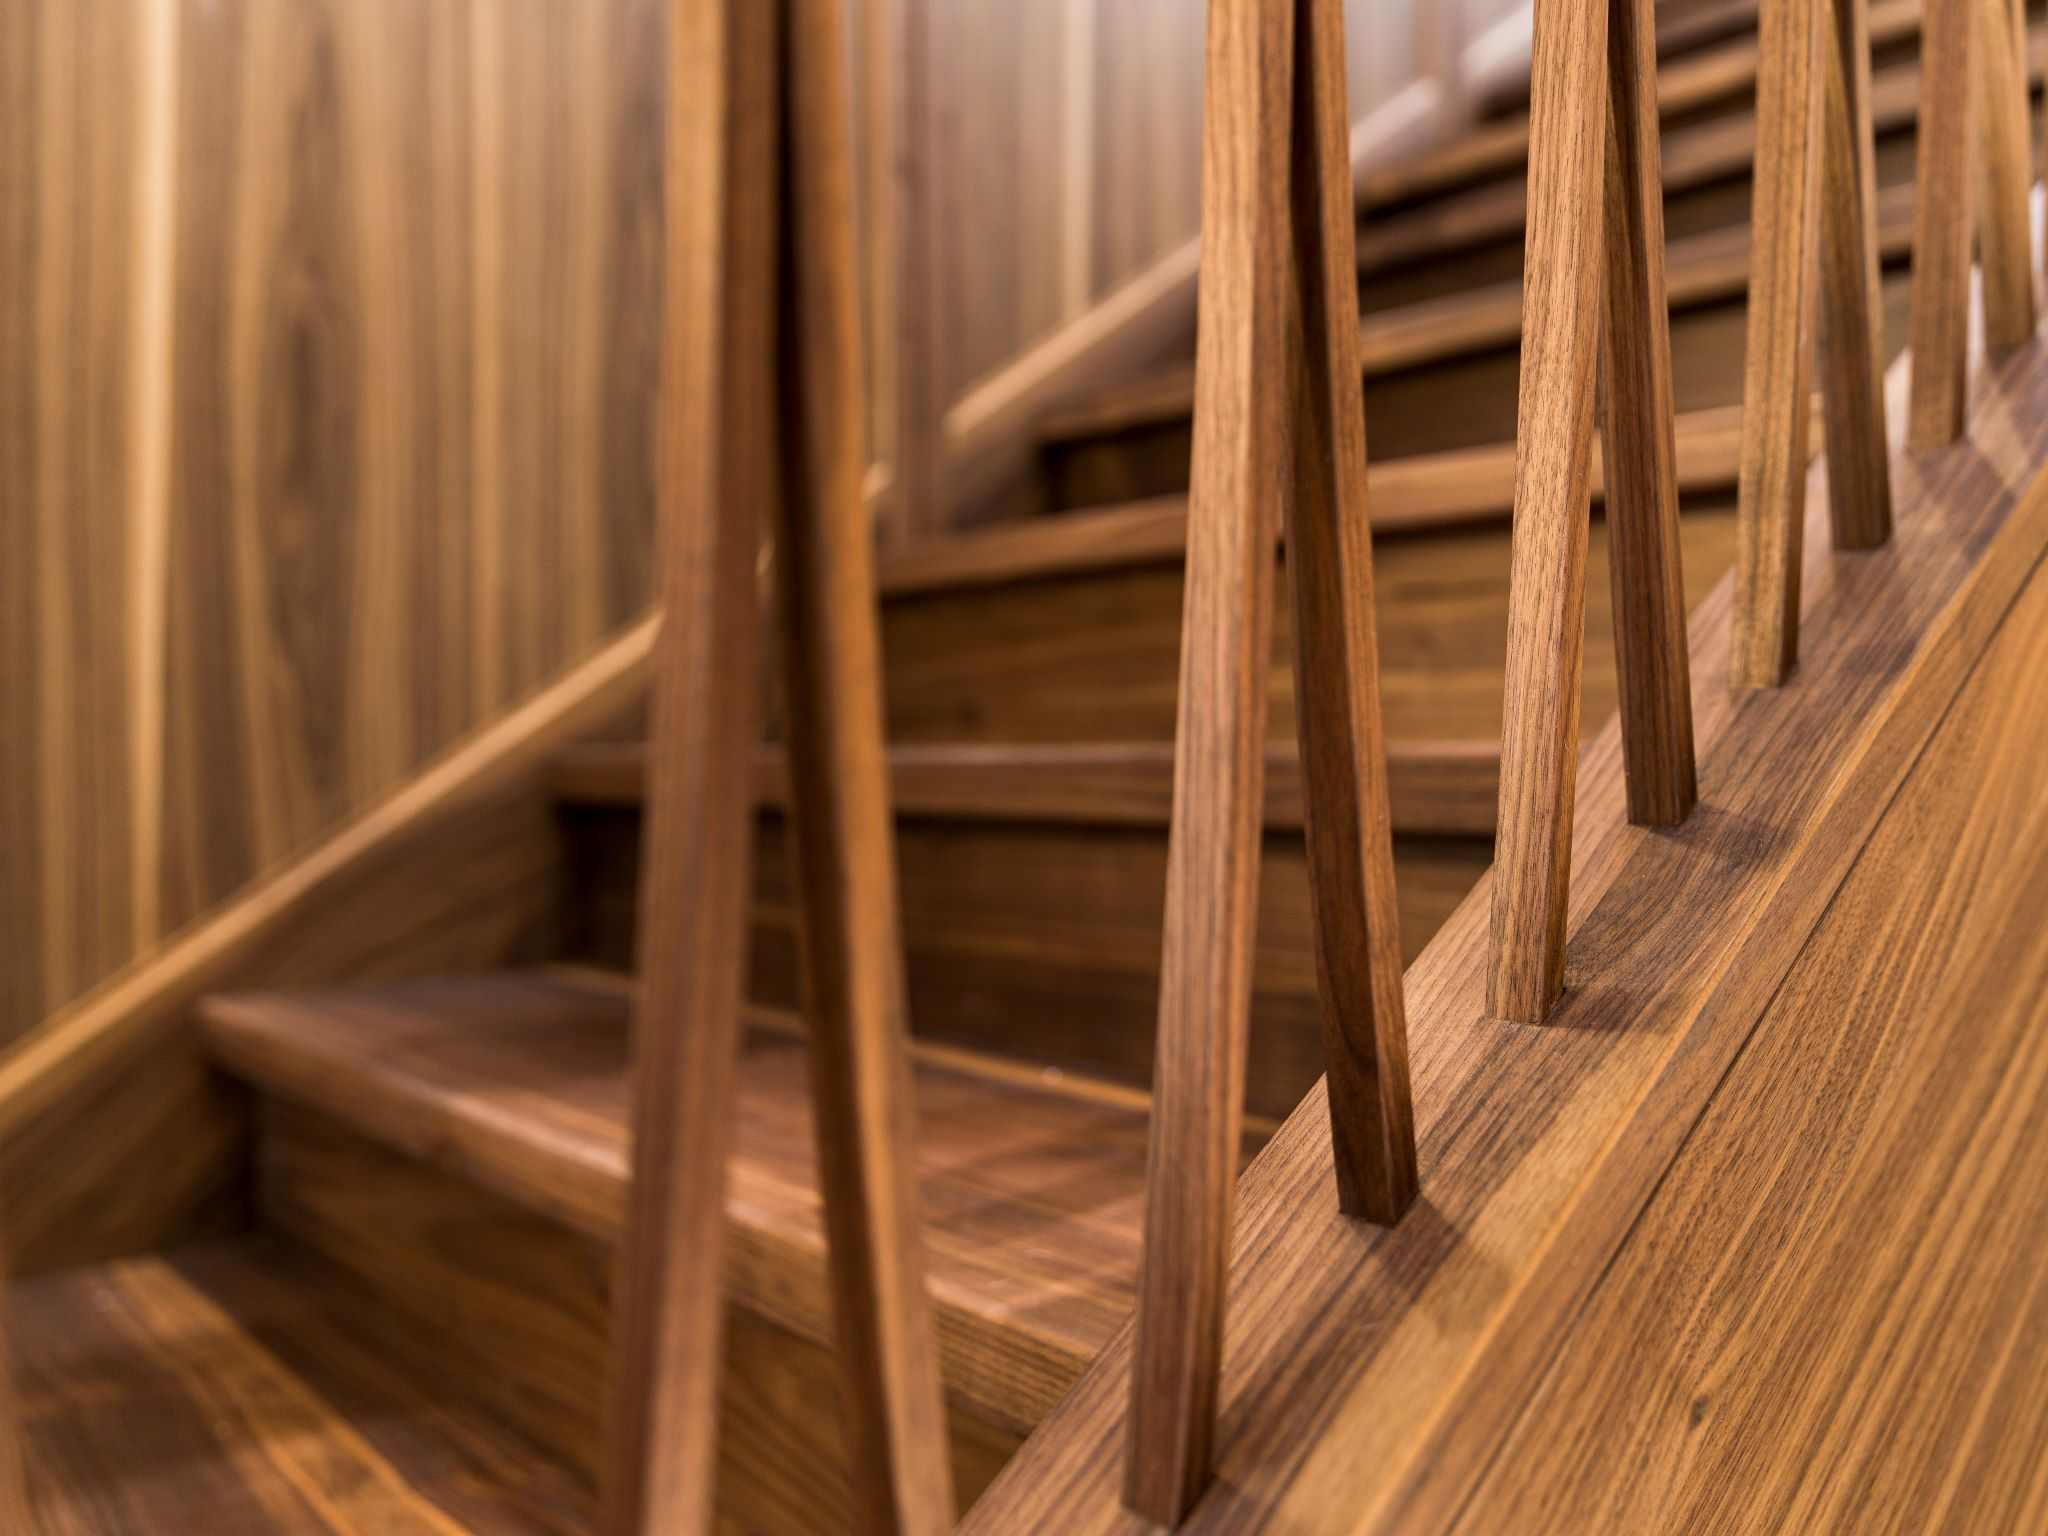 Stair Image 2318